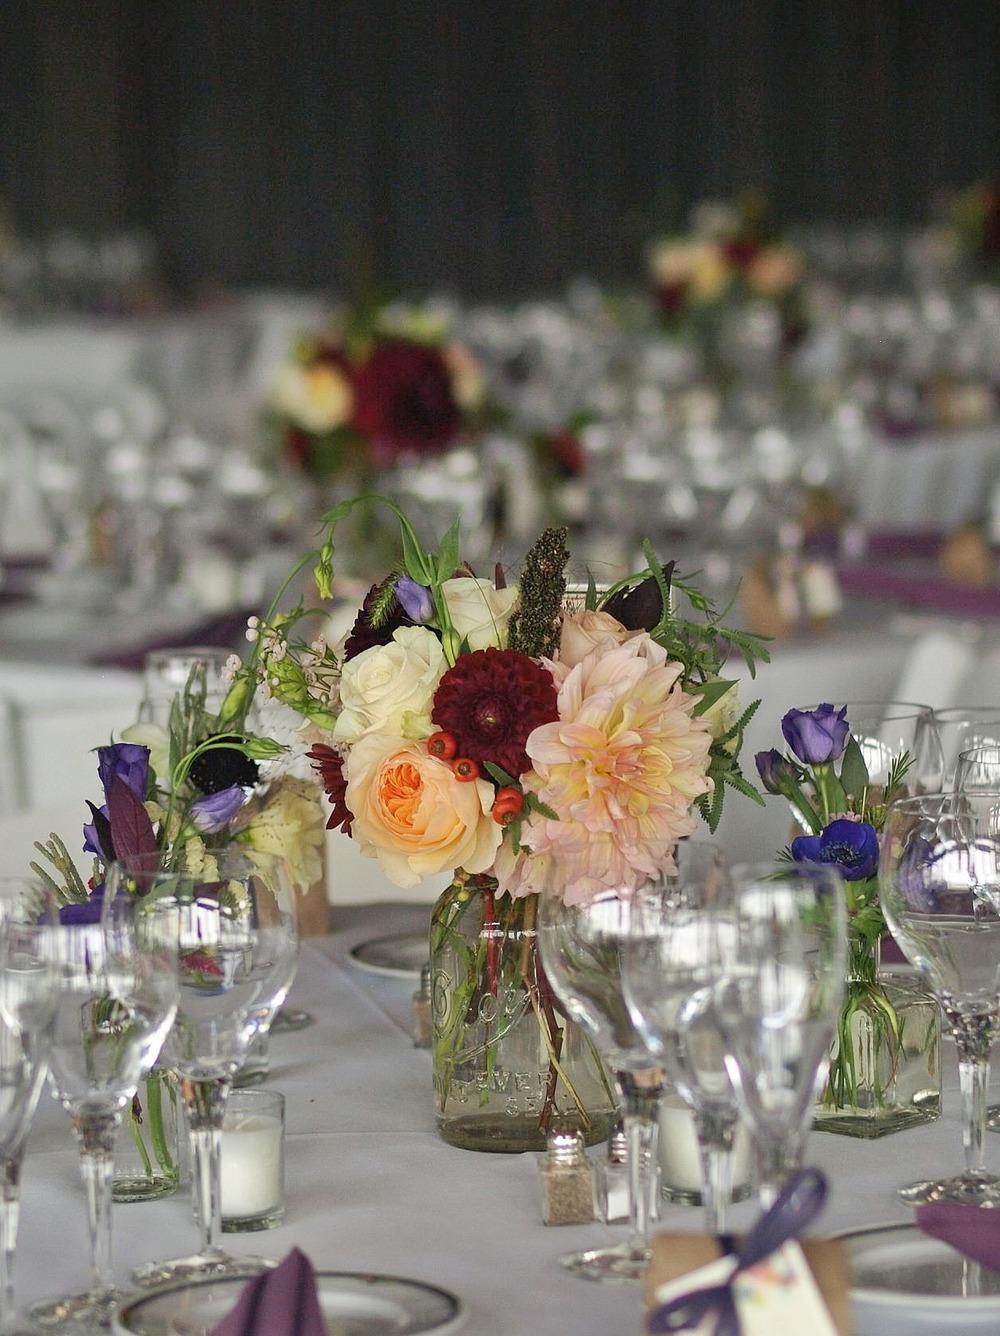 Oreonta house woodstock wedding mason jar centerpiece with garden rose dahlia and wildflowers 1.jpg